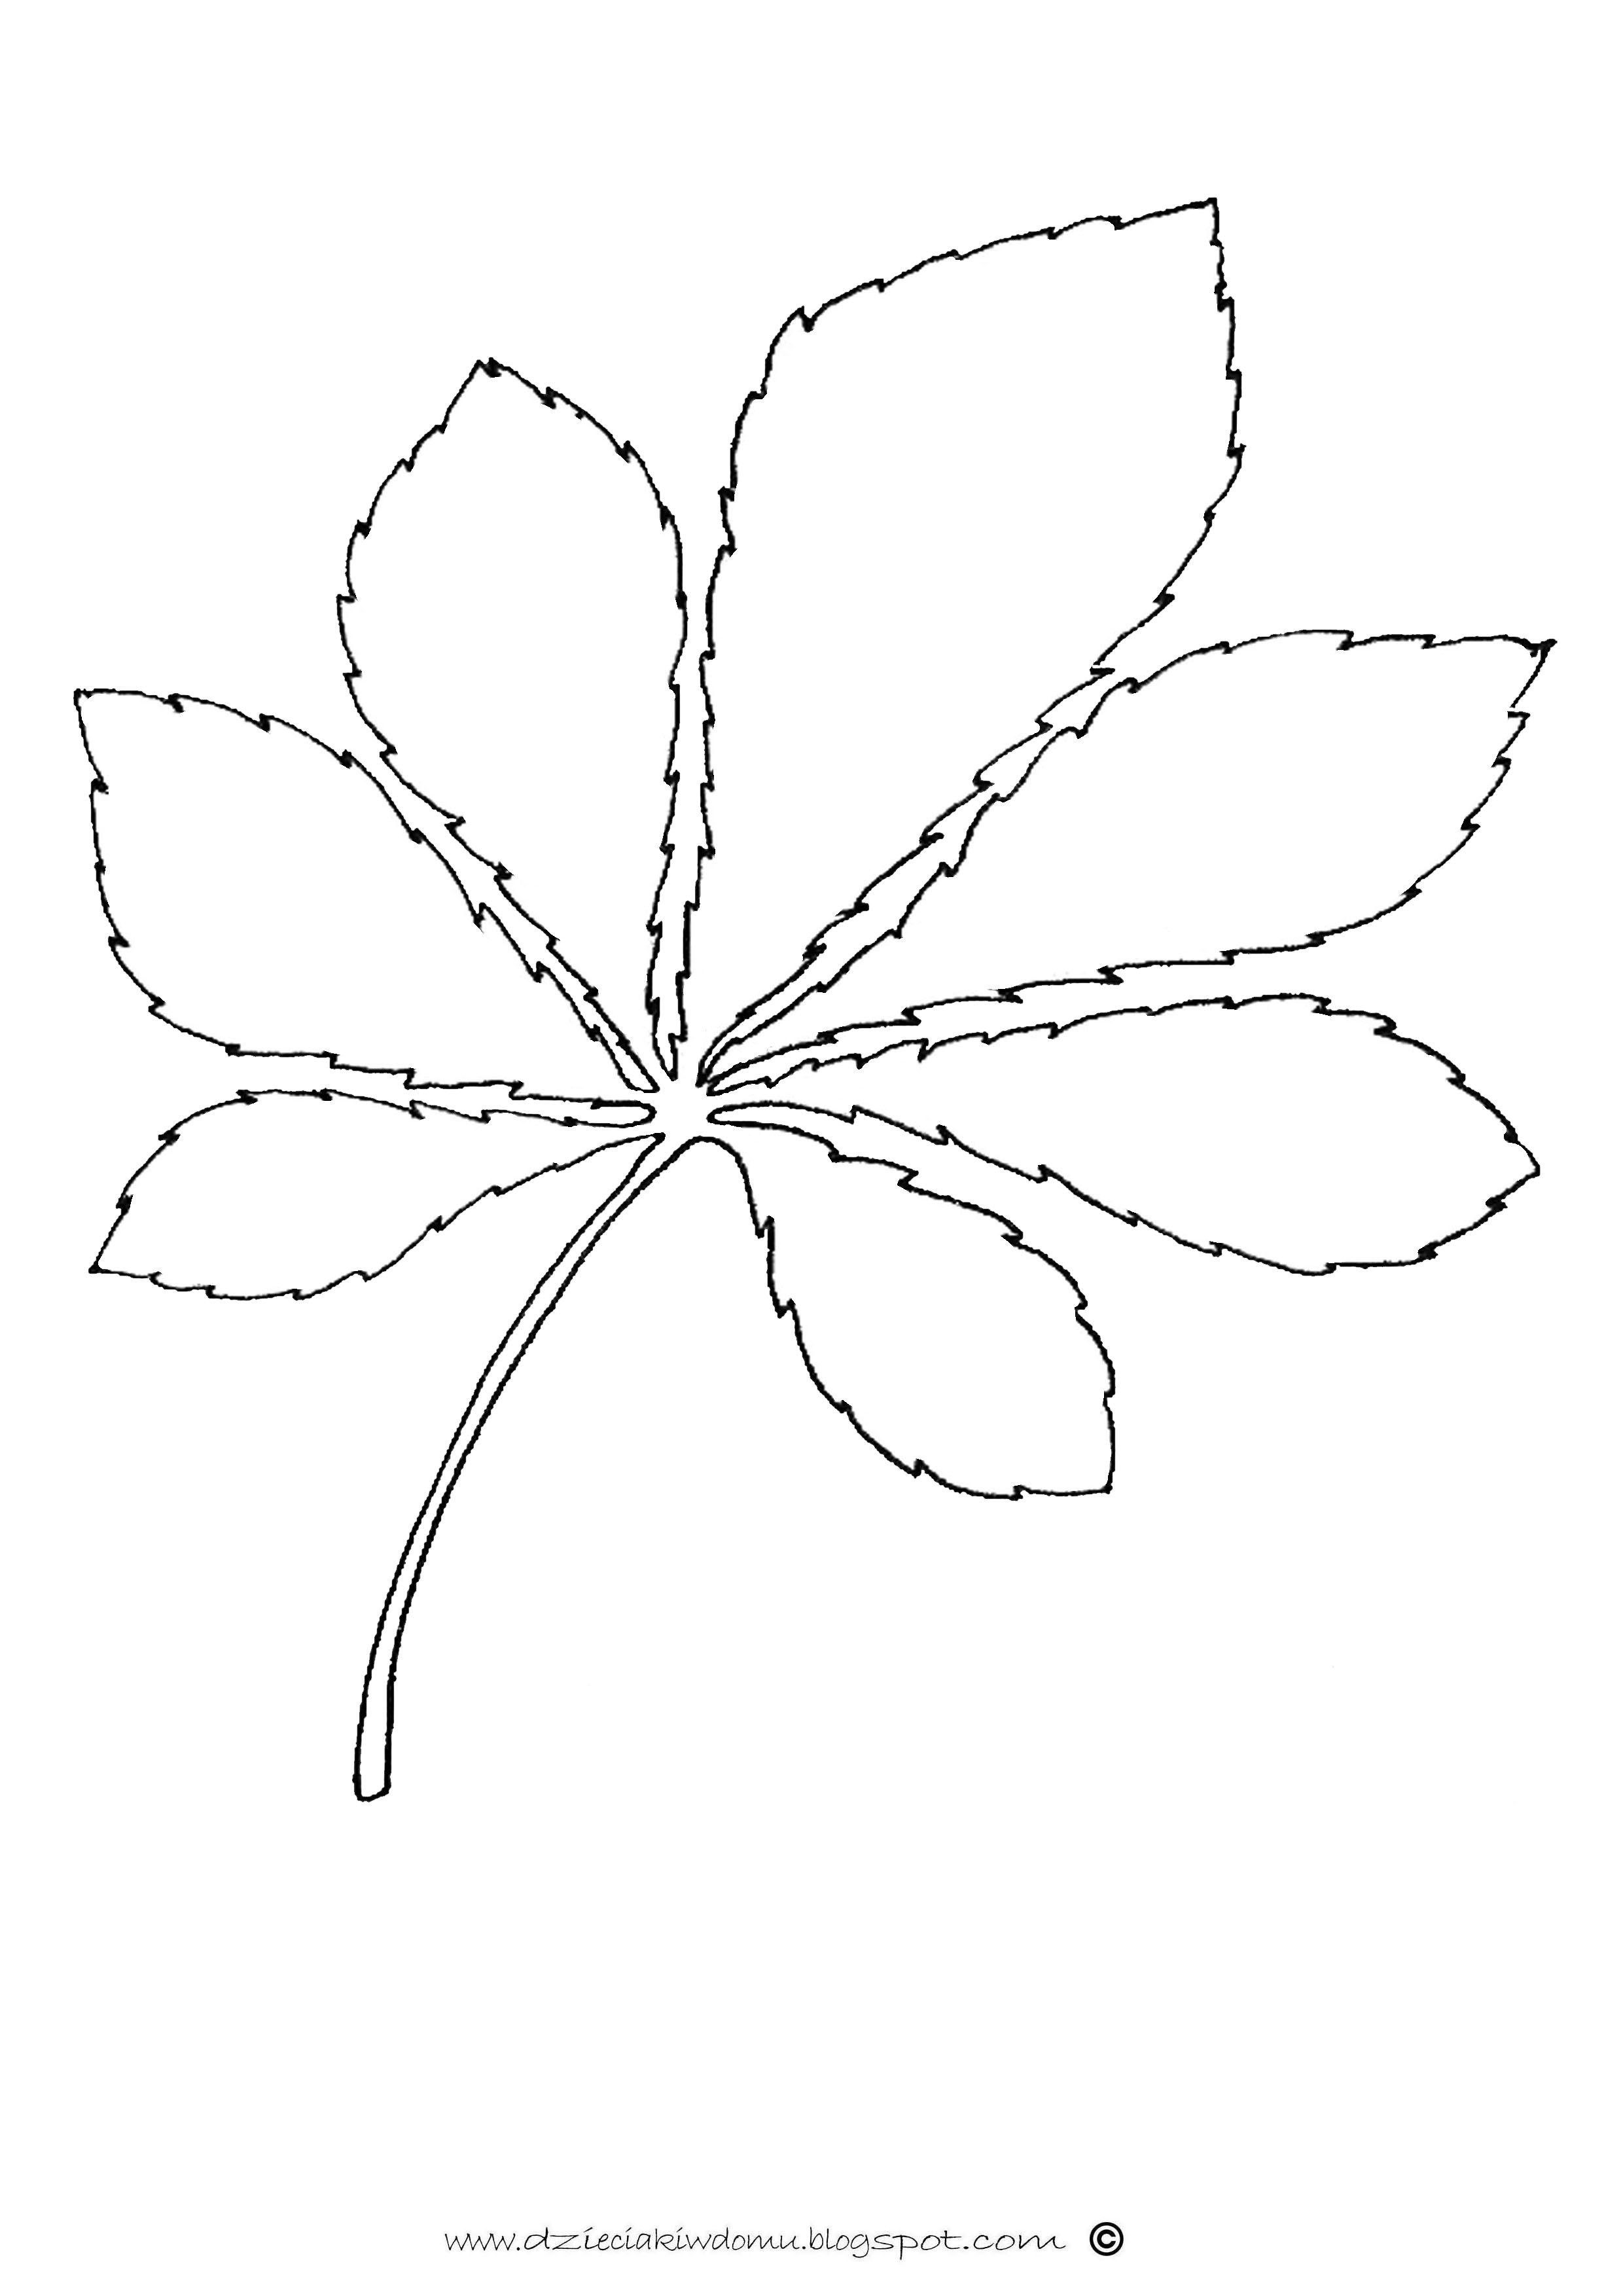 Lisc Kasztanowca Www Dzieciakiwdomu Blogspot Com Quilt Patterns Diy And Crafts Stencils